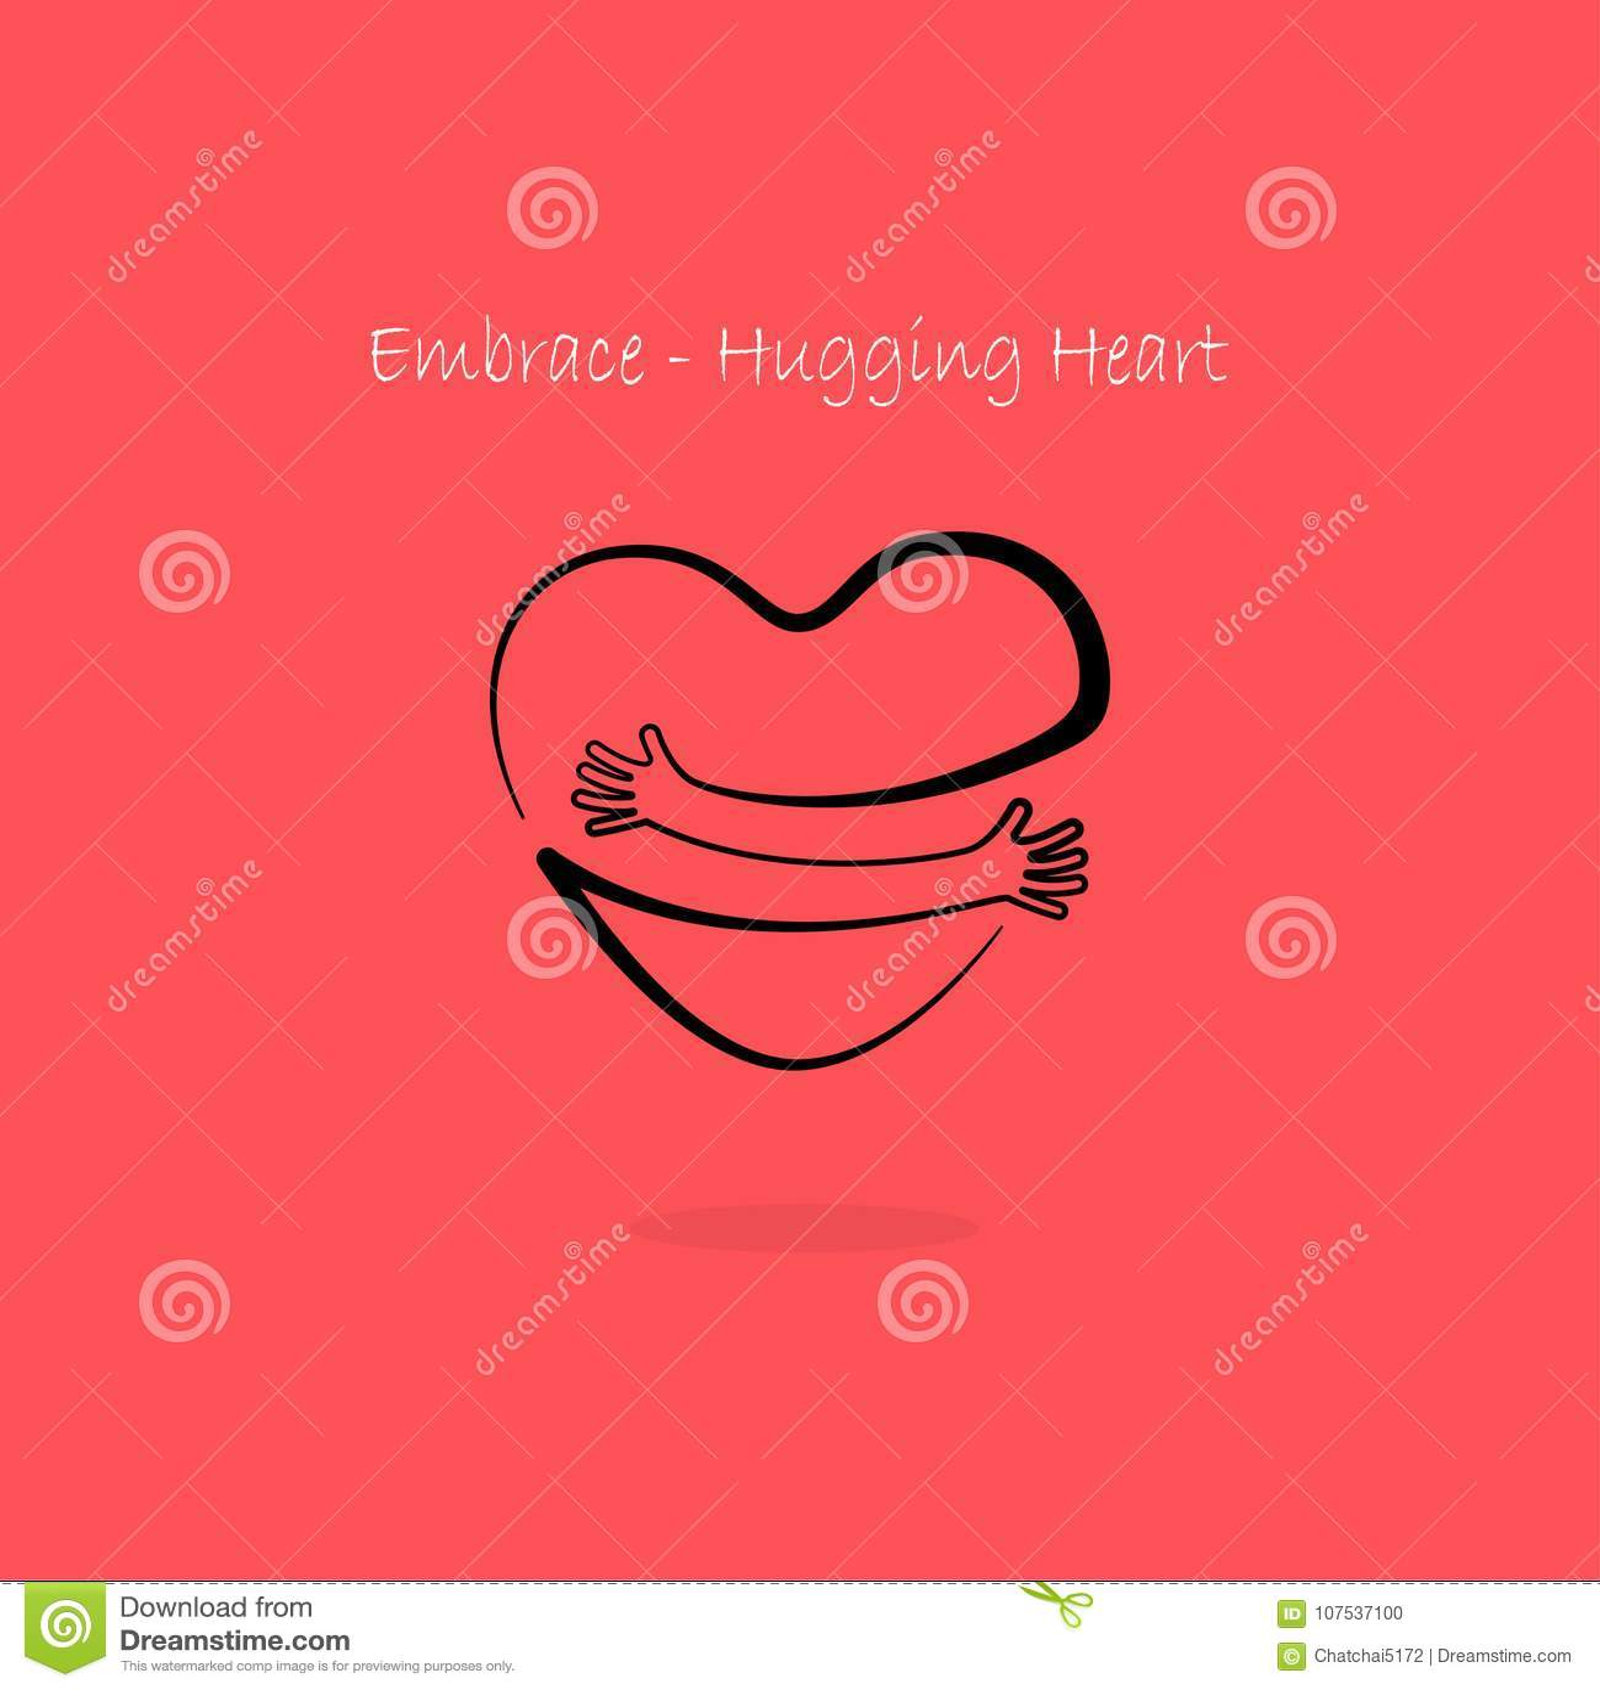 Embracehugging heart symbolg yourself logolove yourself log embracehugging heart symbolg yourself logolove yourself log buycottarizona